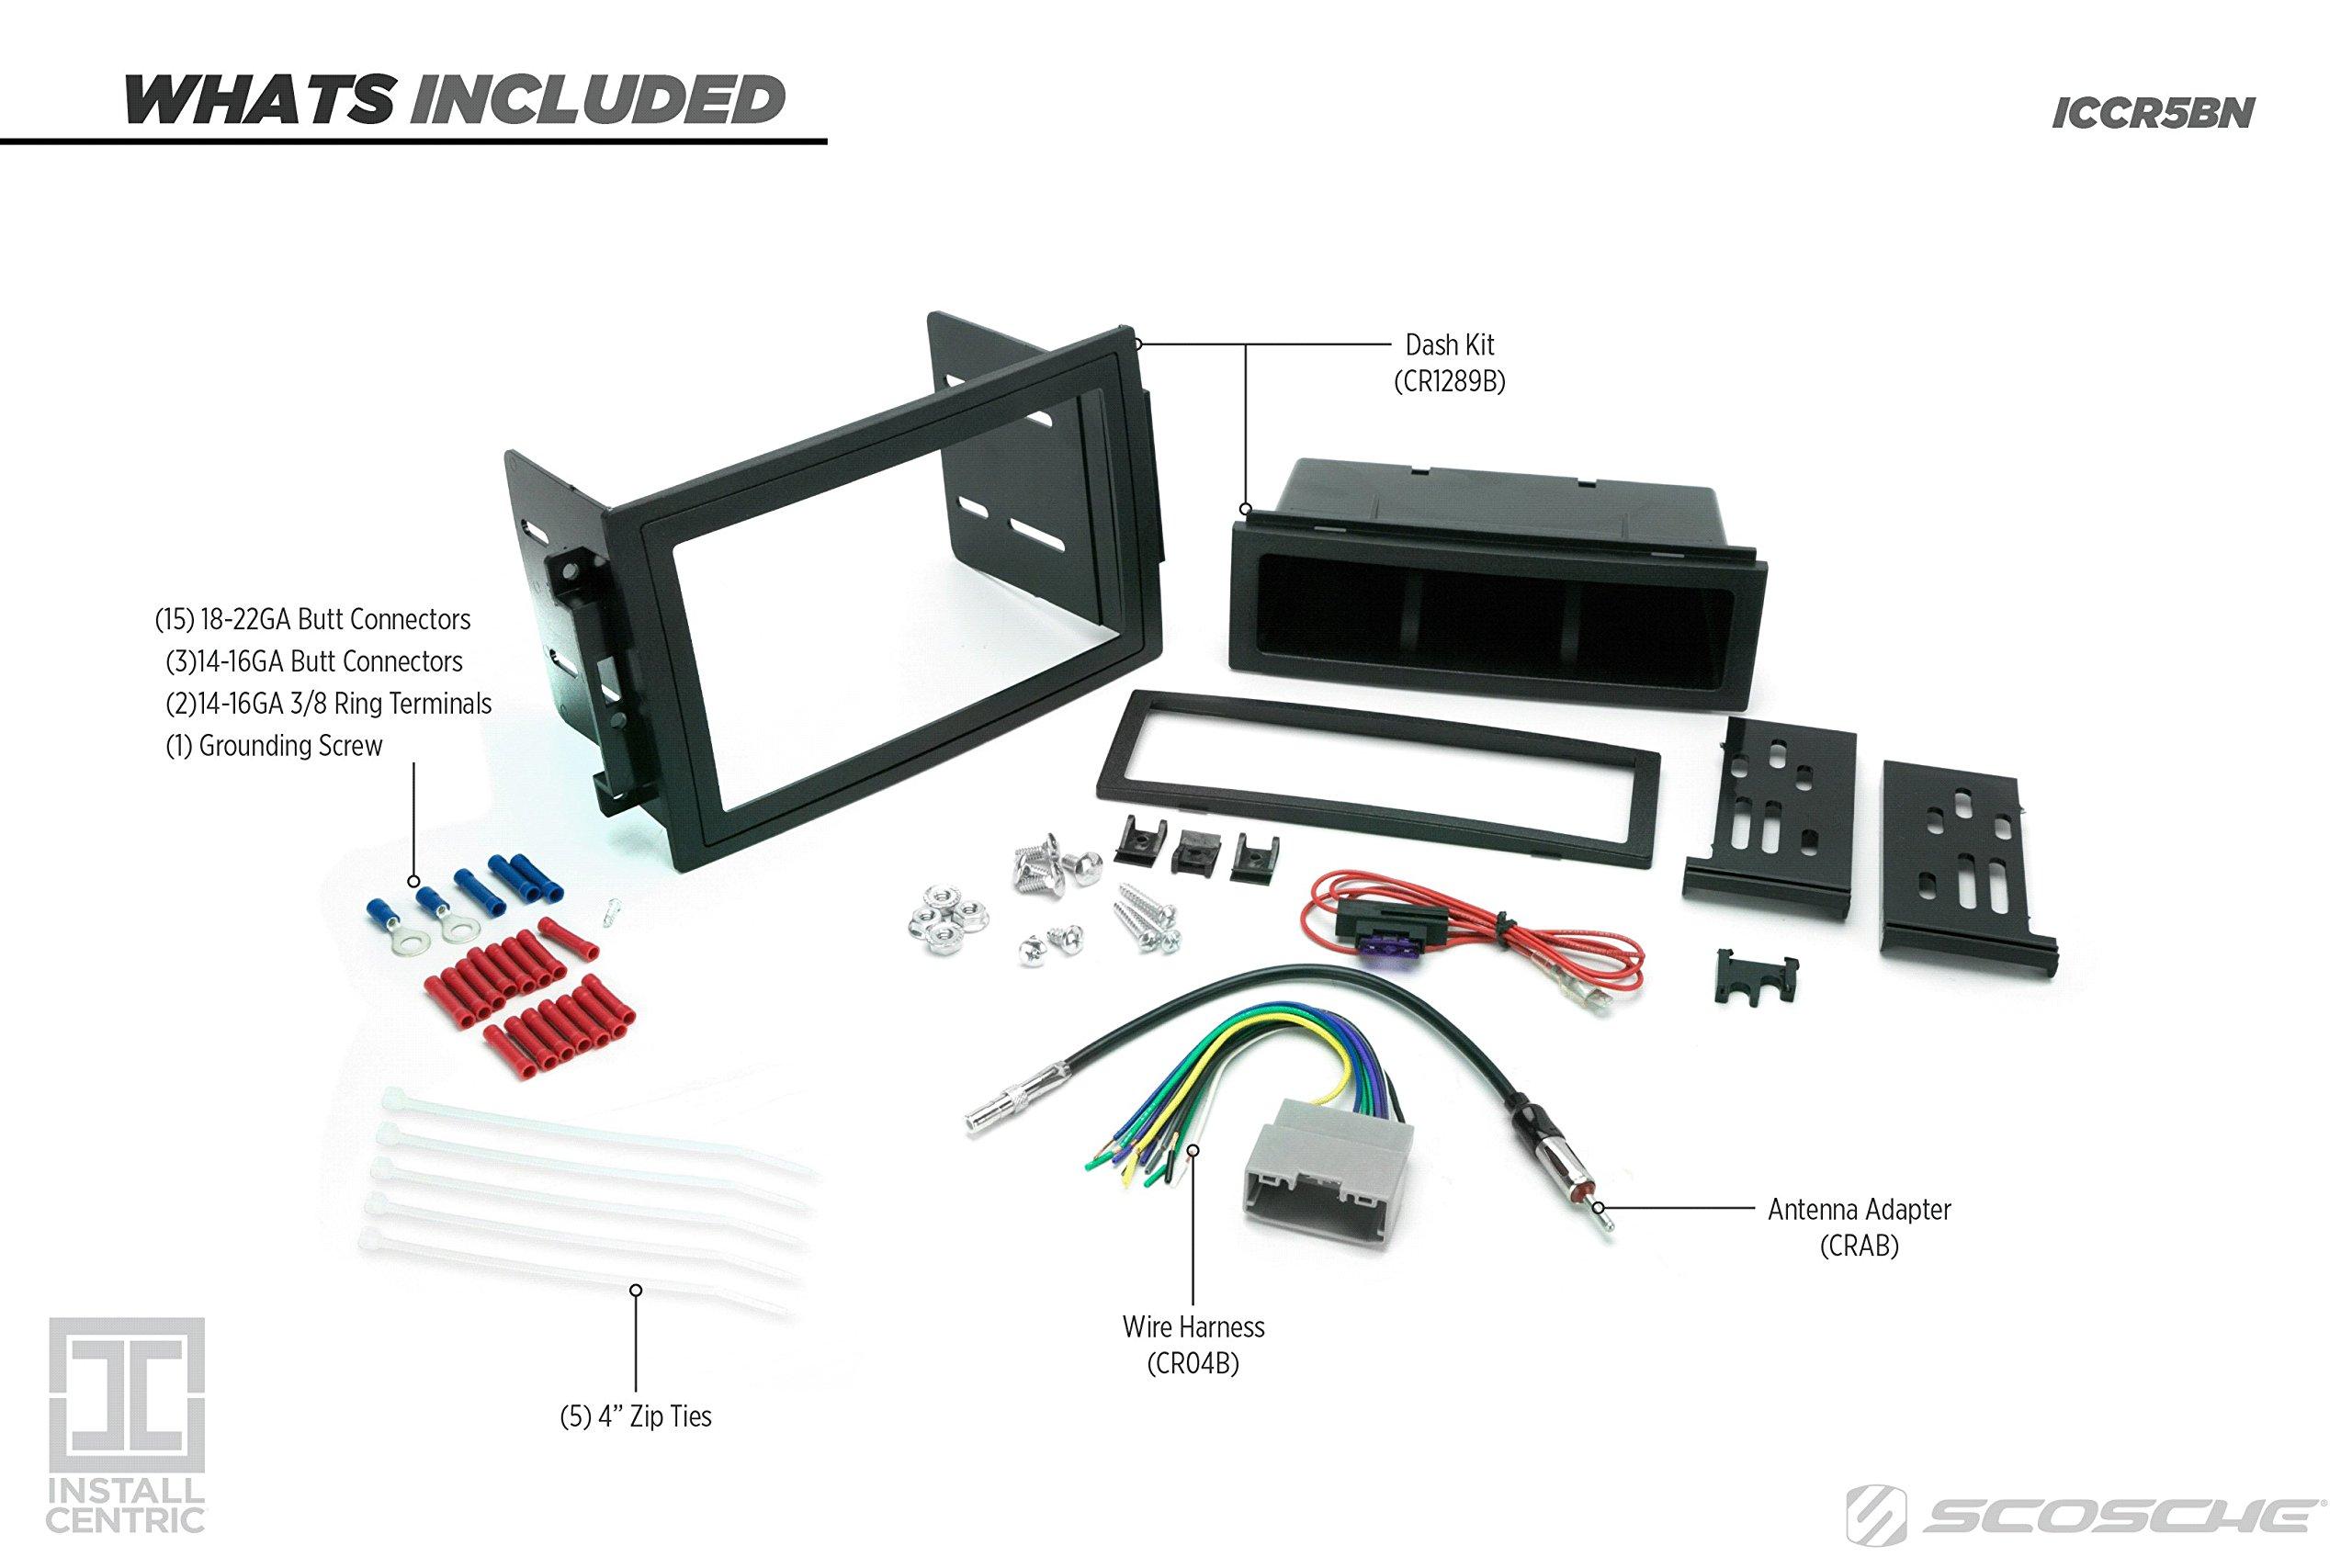 scosche wiring harness diagram 88 jeep cherokee schematic diagram